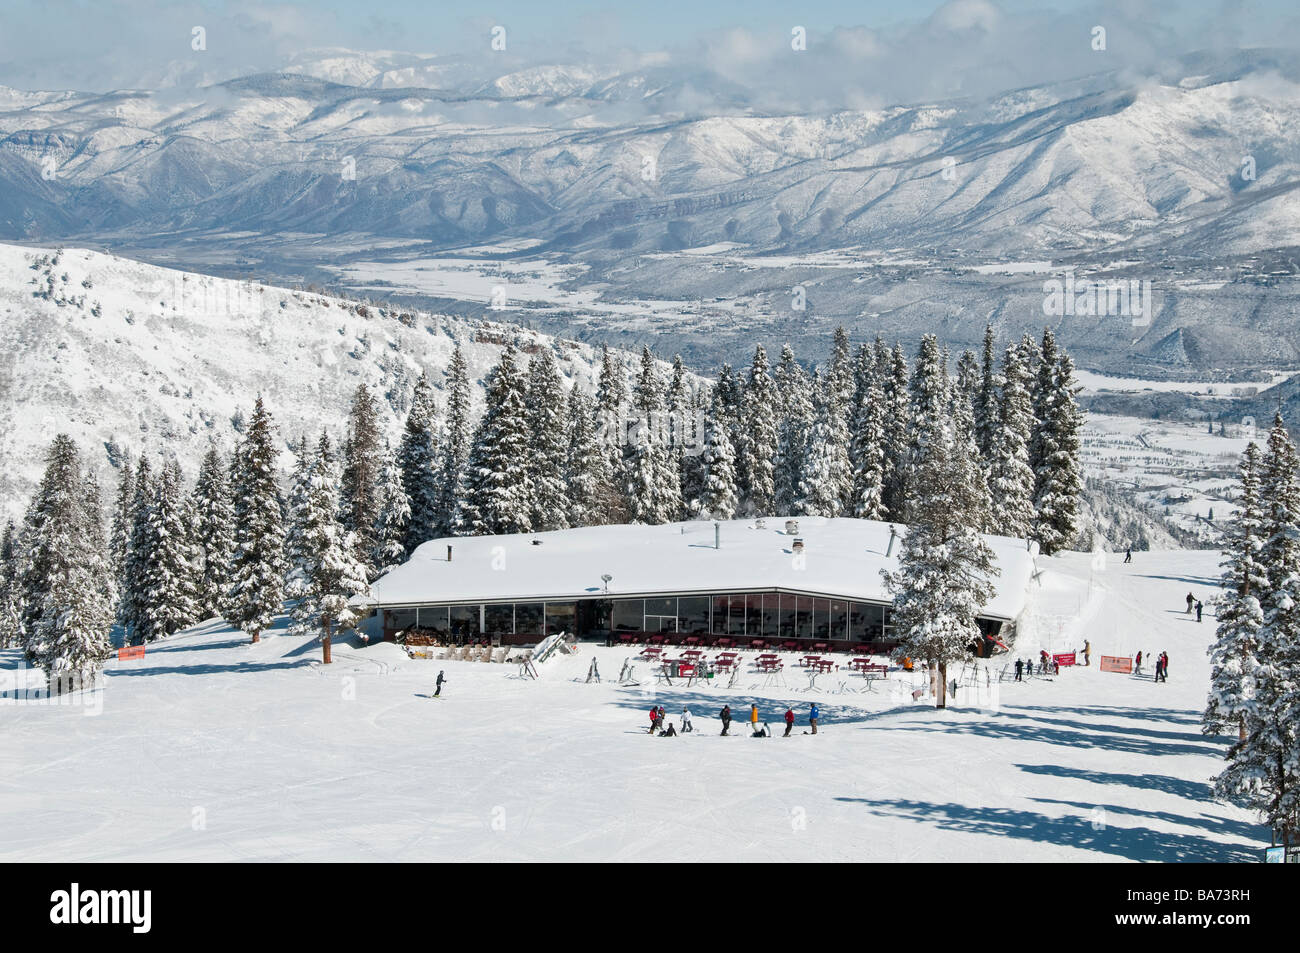 Merry-Go-Round day lodge, Aspen Highlands Ski Area, Aspen, Colorado. - Stock Image